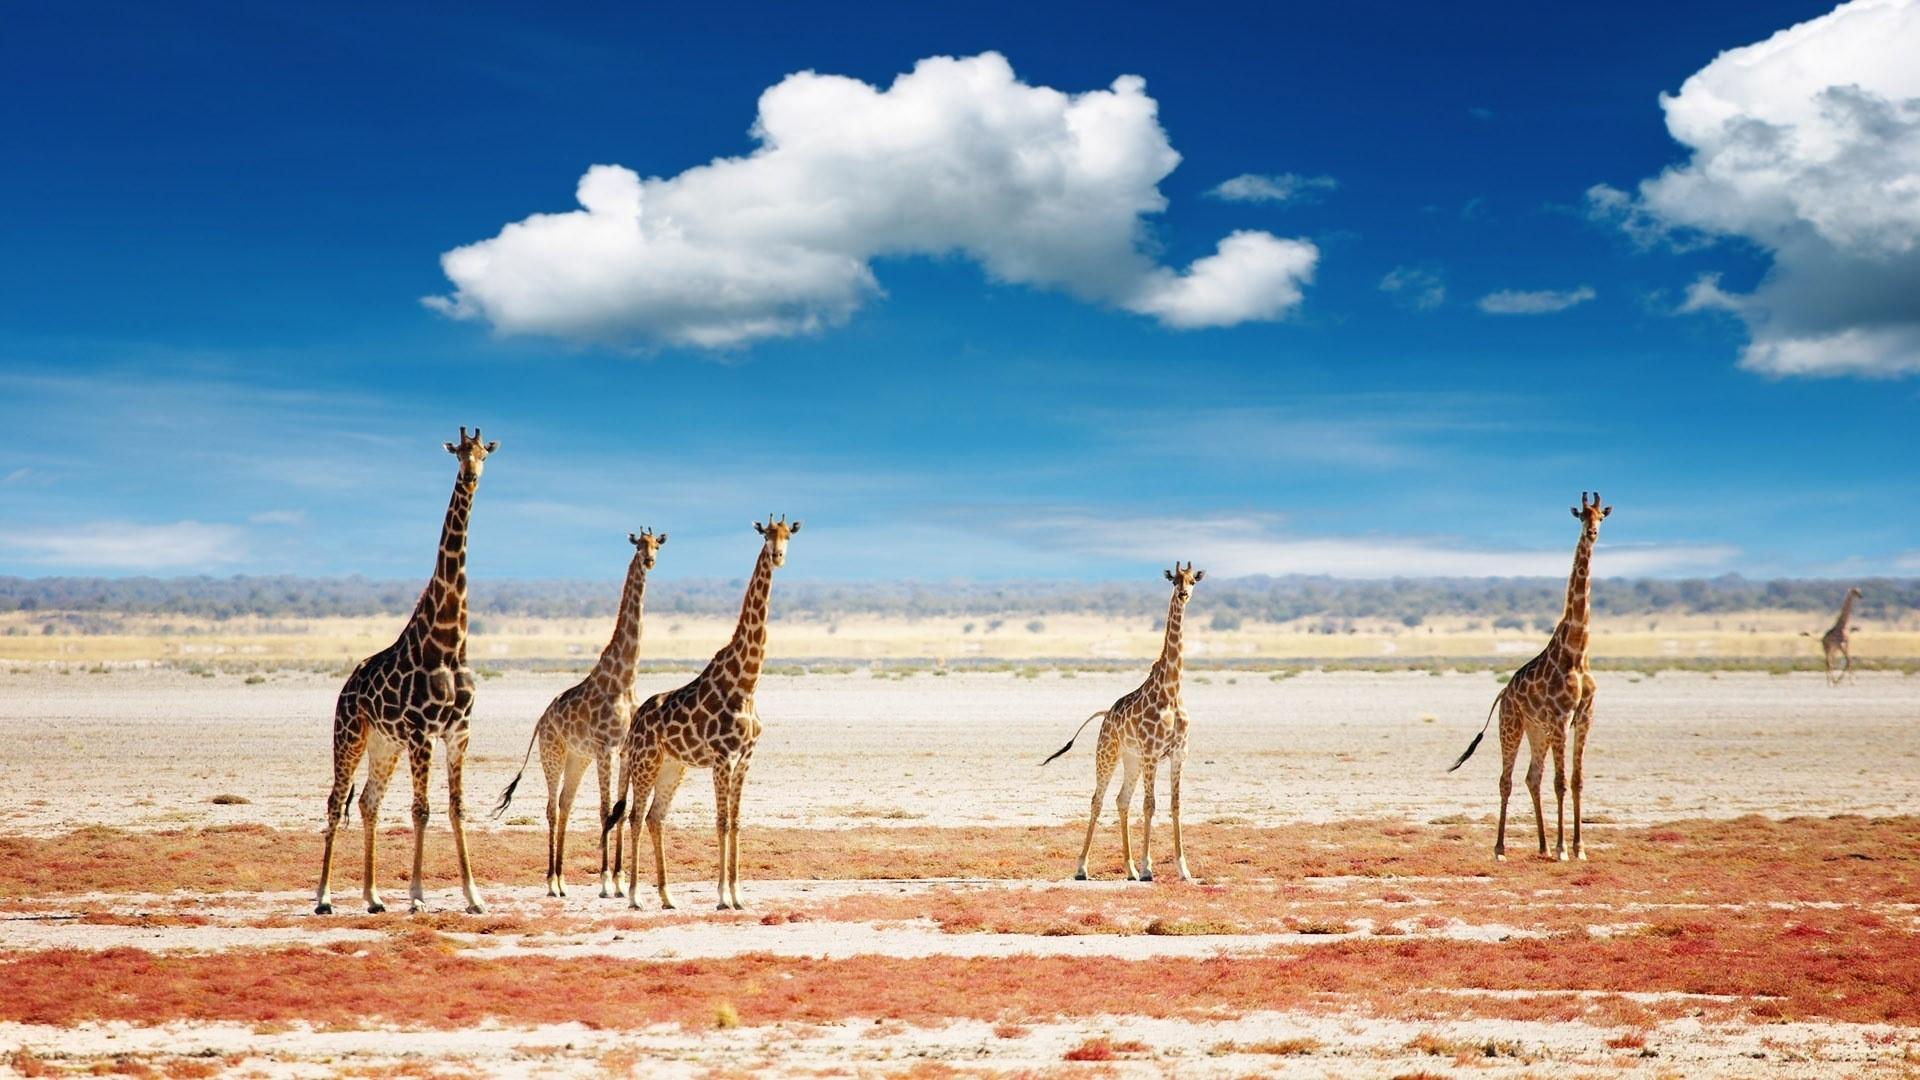 Giraffe Background